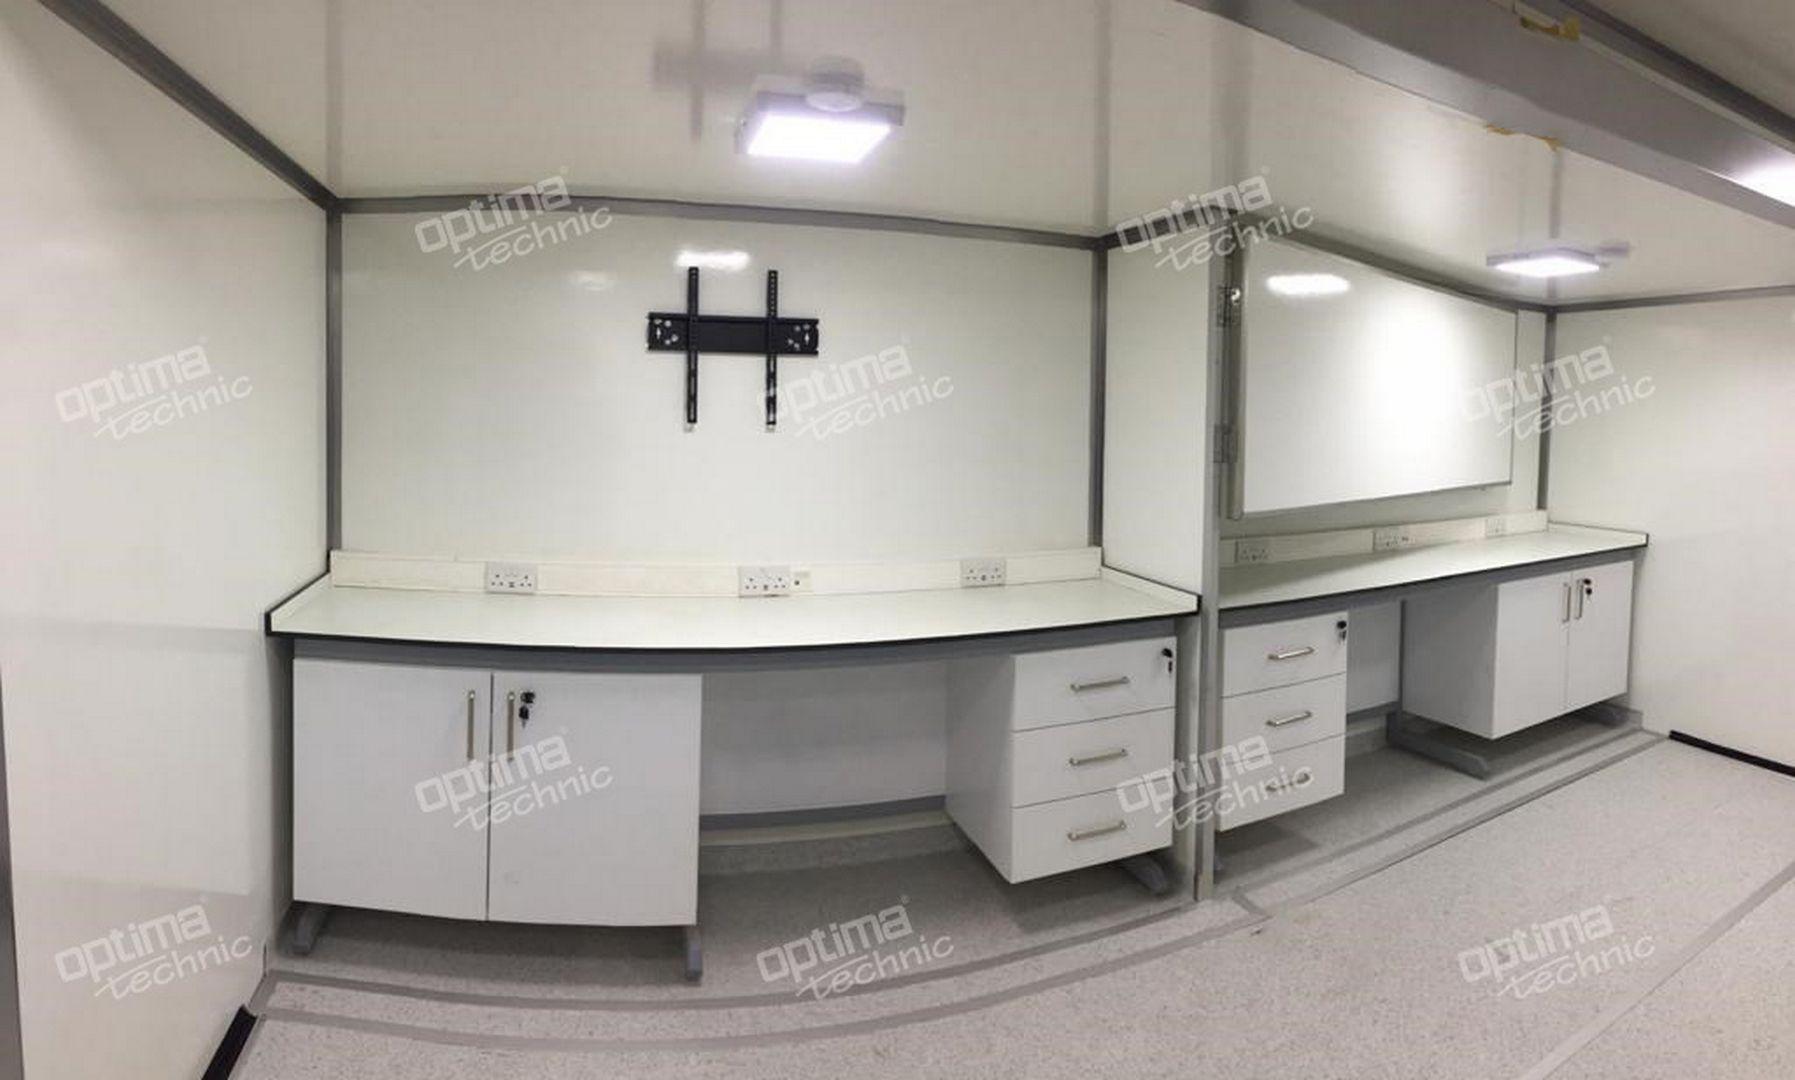 Mobile Criminal Investigation Laboratory